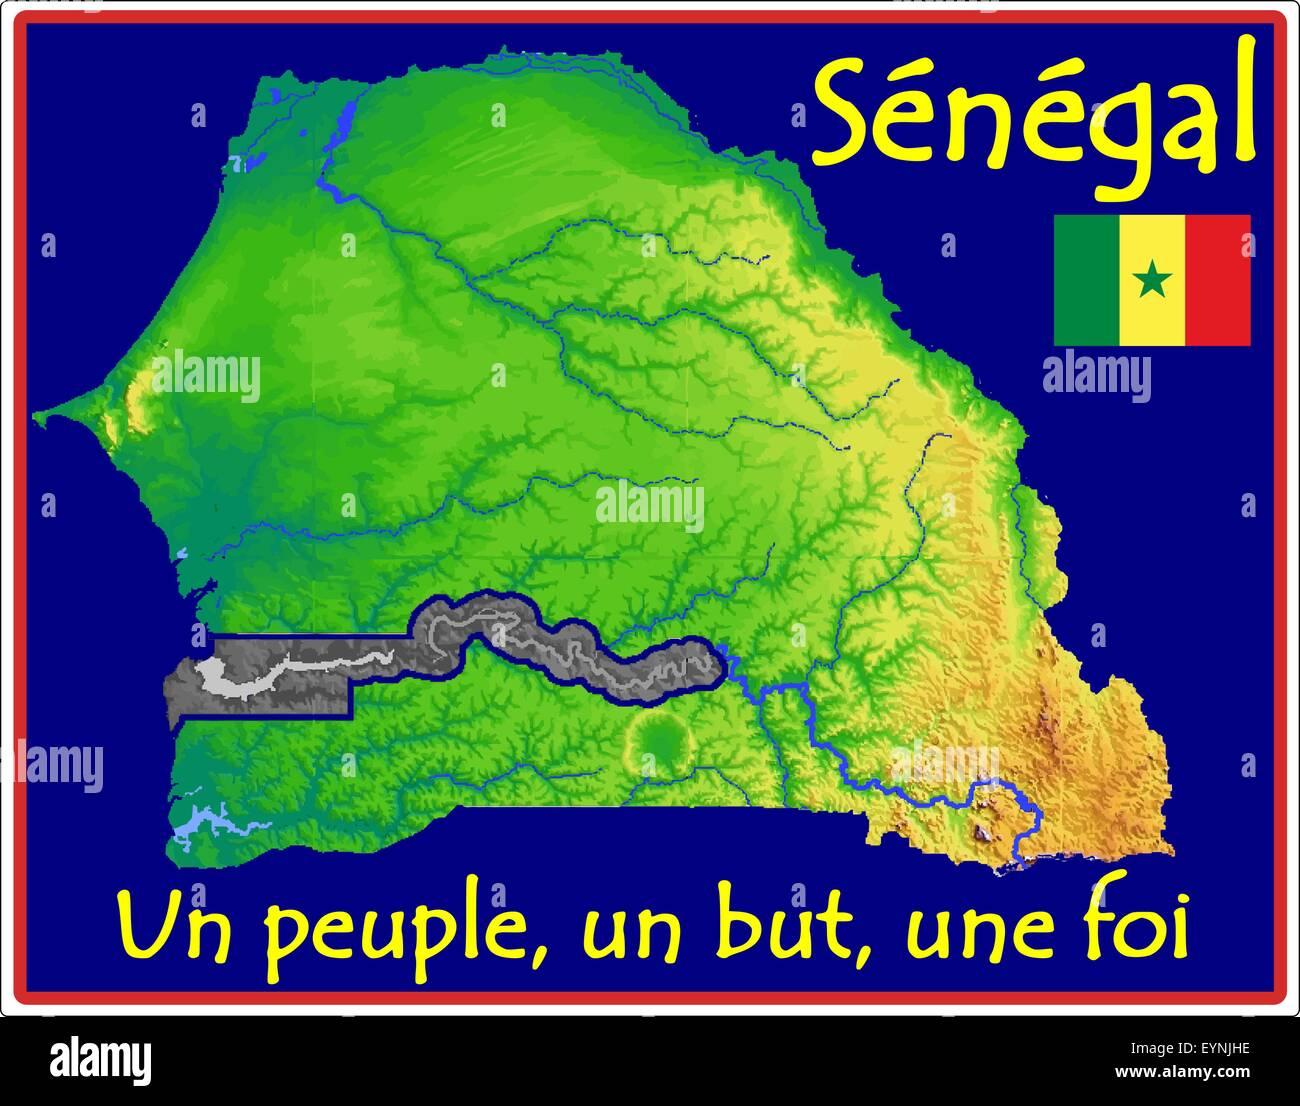 Senegal Map Flag Motto Stock Vector Art Illustration Vector - Senegal map